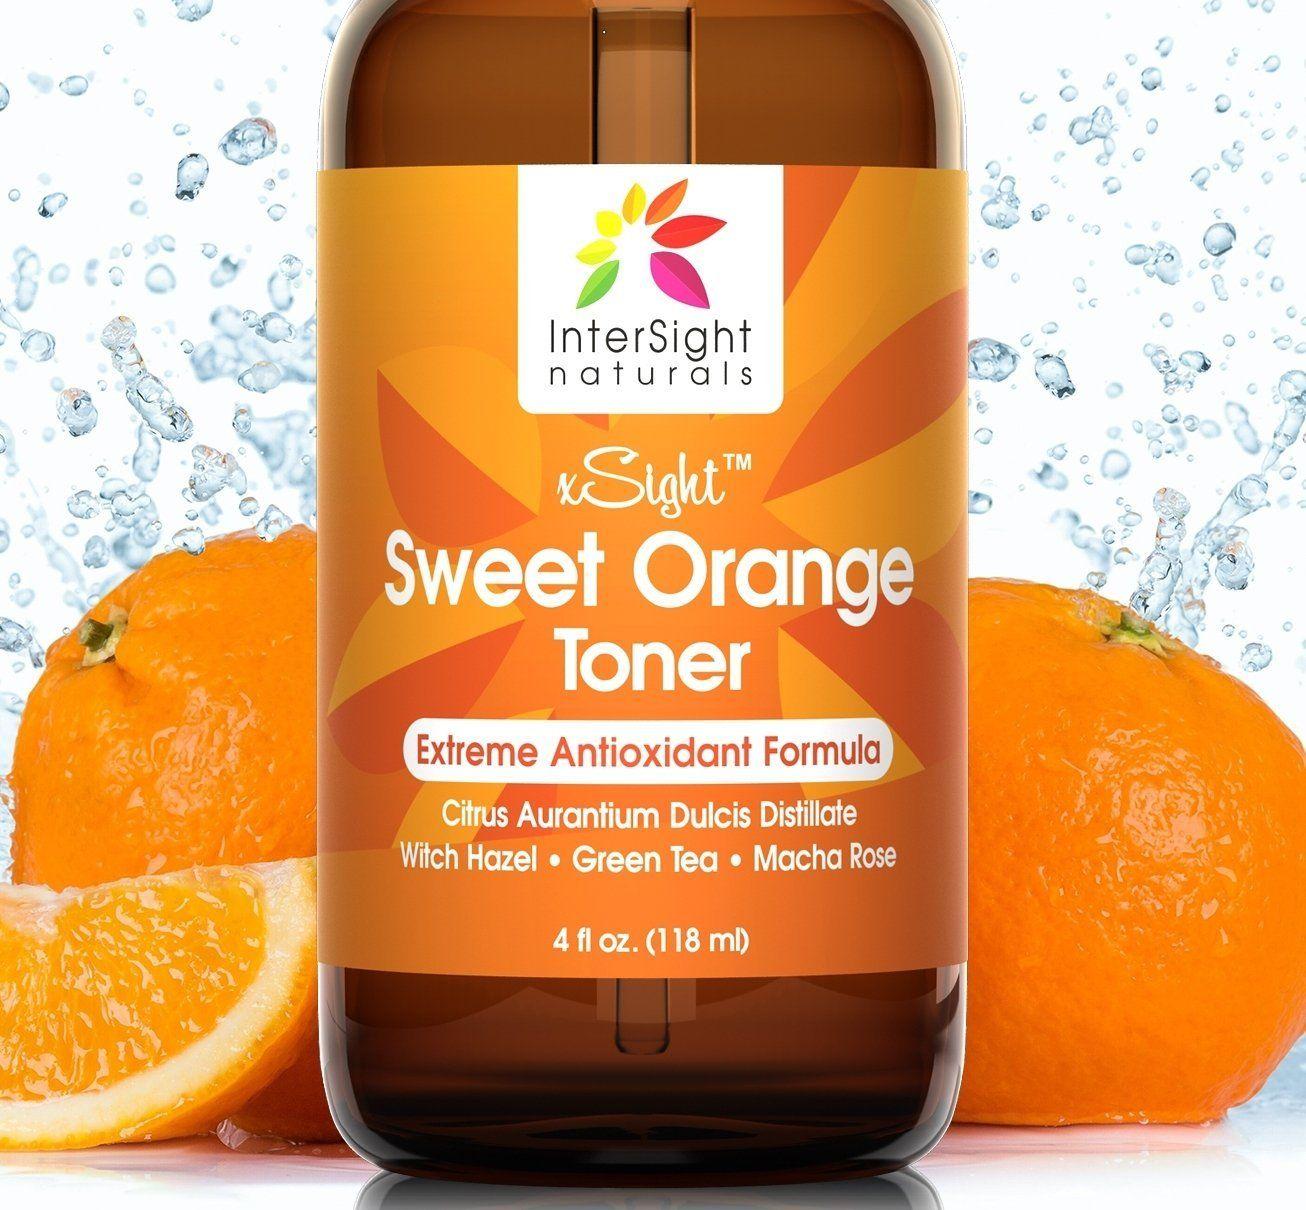 Intersight Sweet Orange Skin Toner For Face Huge 4 Oz No 1 Natural Antioxidant Facial Toner With Citrus Aurantium Dul Orange Skin Skin Toner Toner For Face